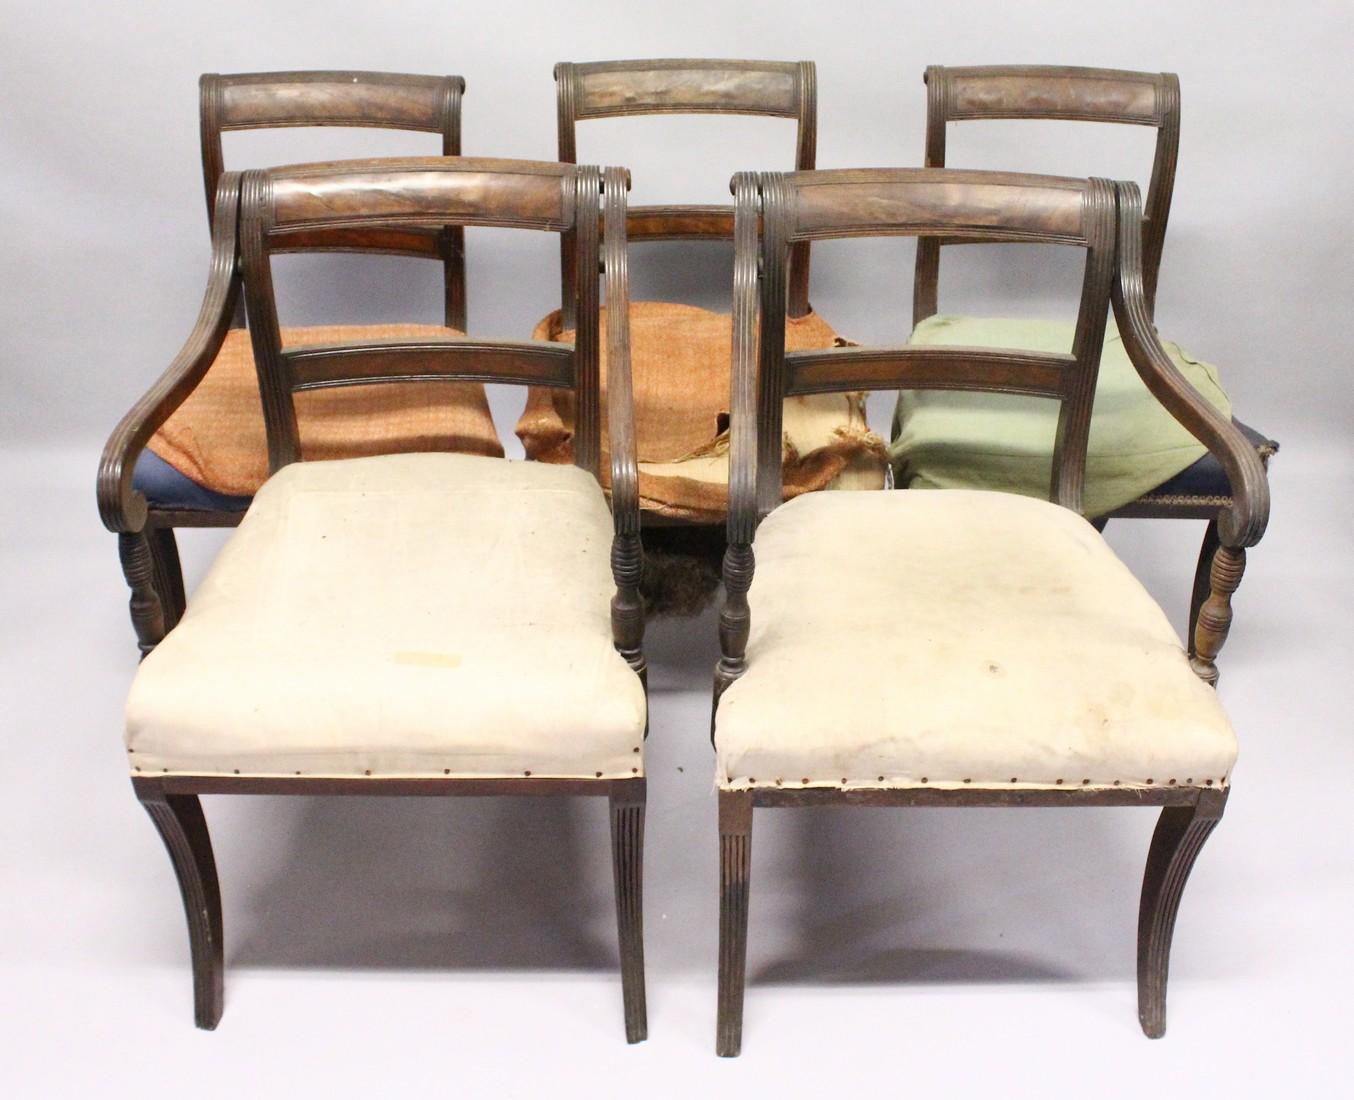 A PAIR OF MAHOGANY, SABRE LEG ARM CHAIRS and three matching single chairs.